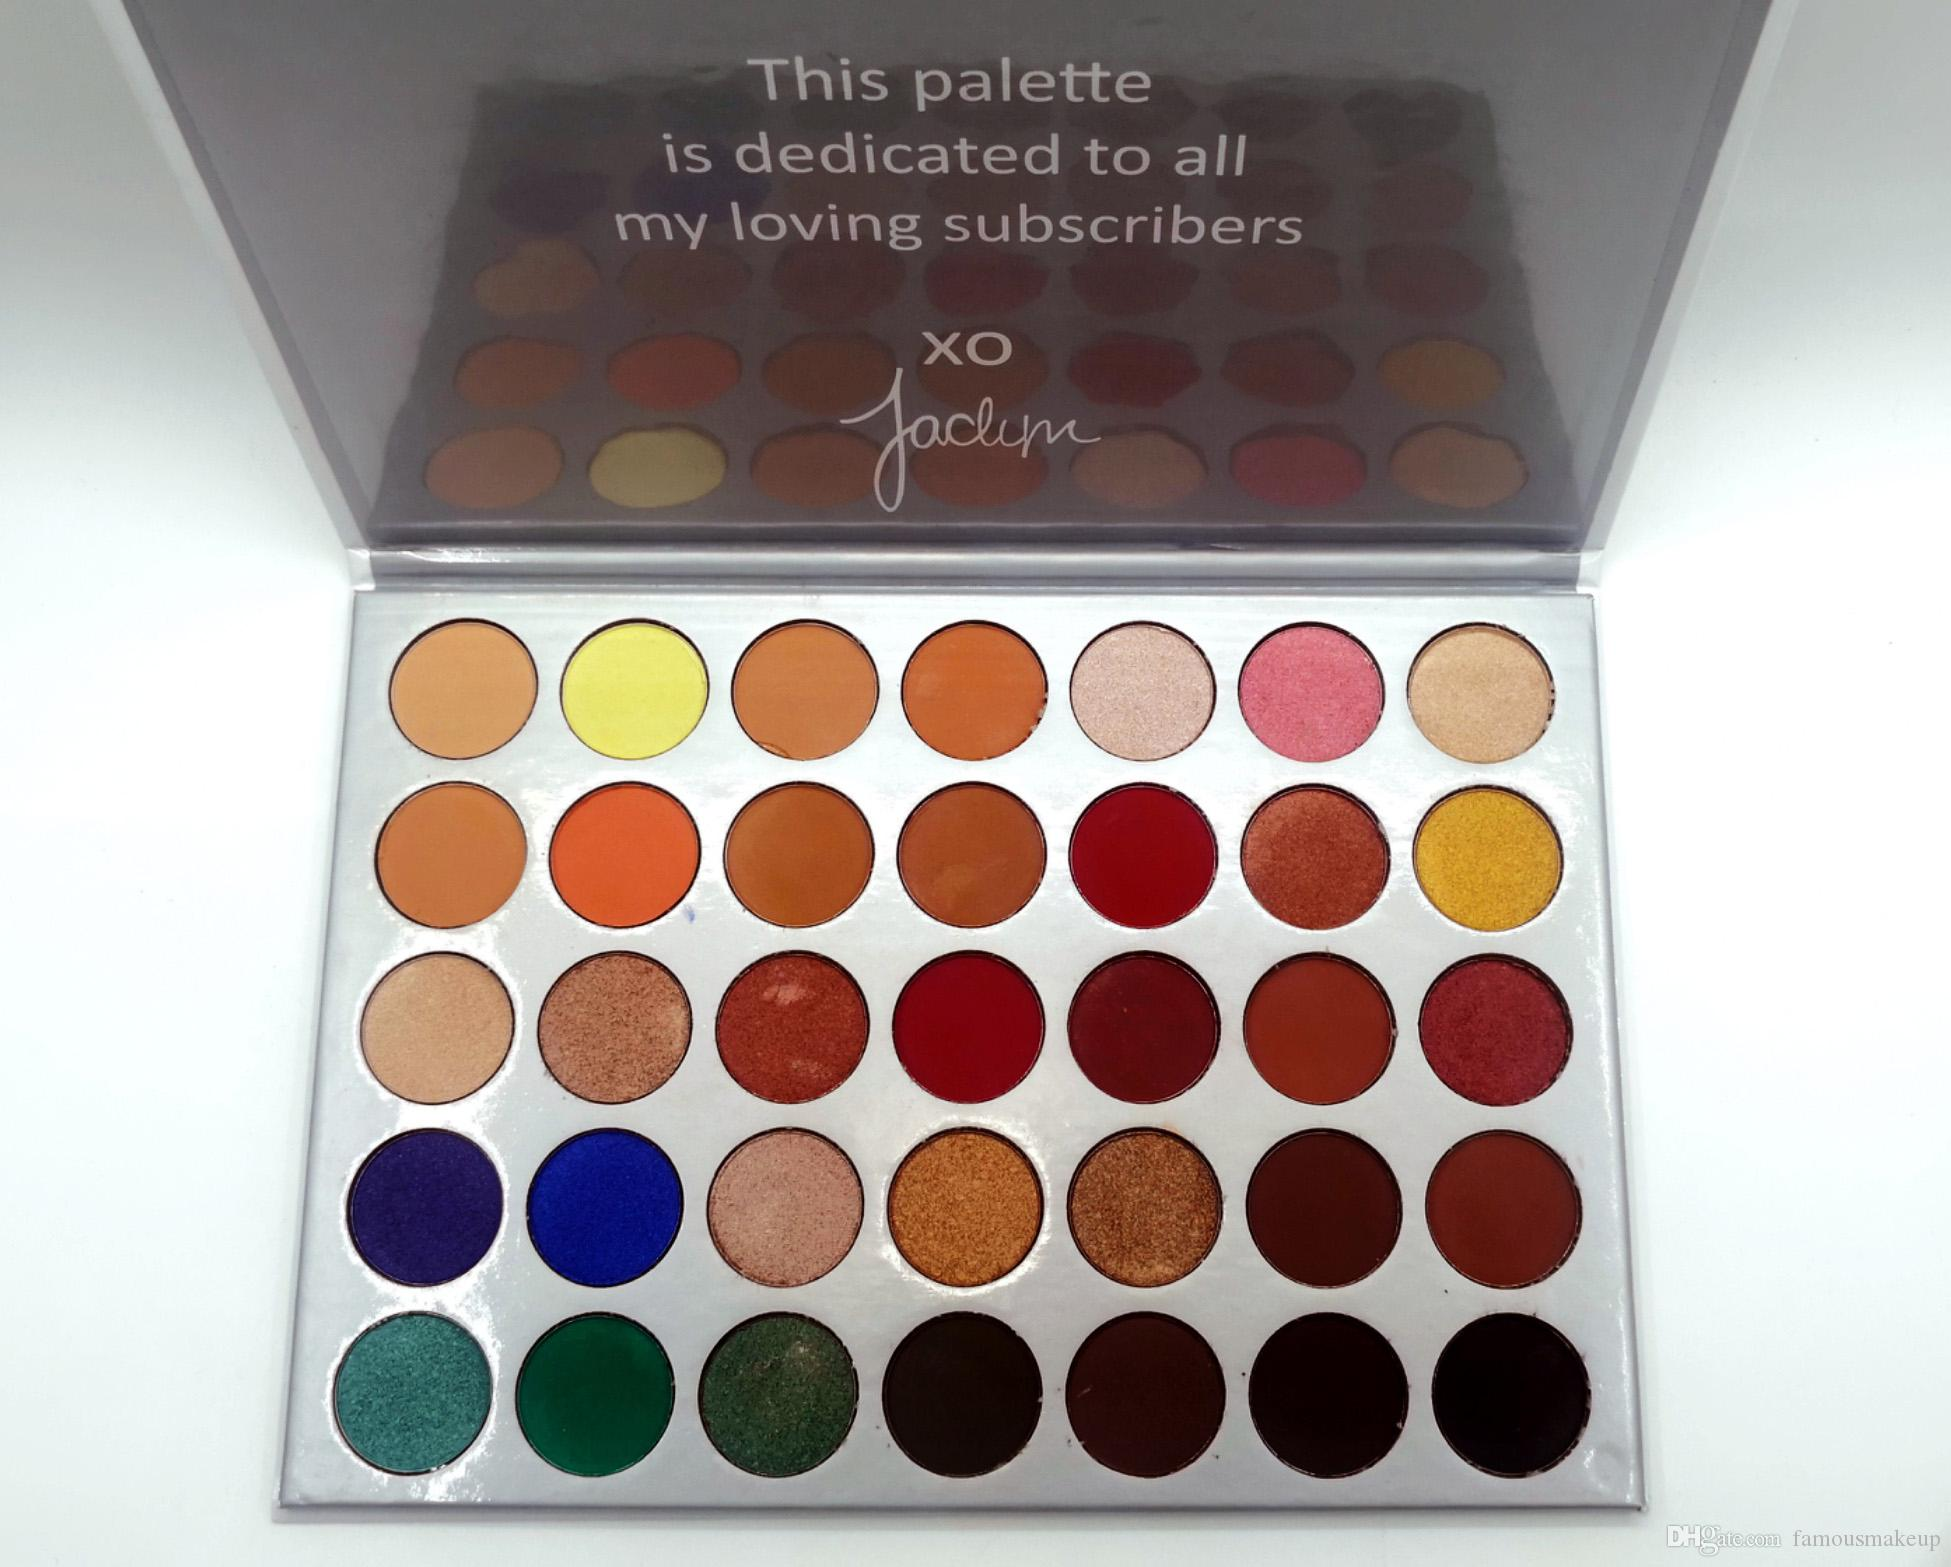 A +++ Kalite !!!! Stokta M marka makyaj Göz Farı Paleti 3 * 5Color far Paleti'nde